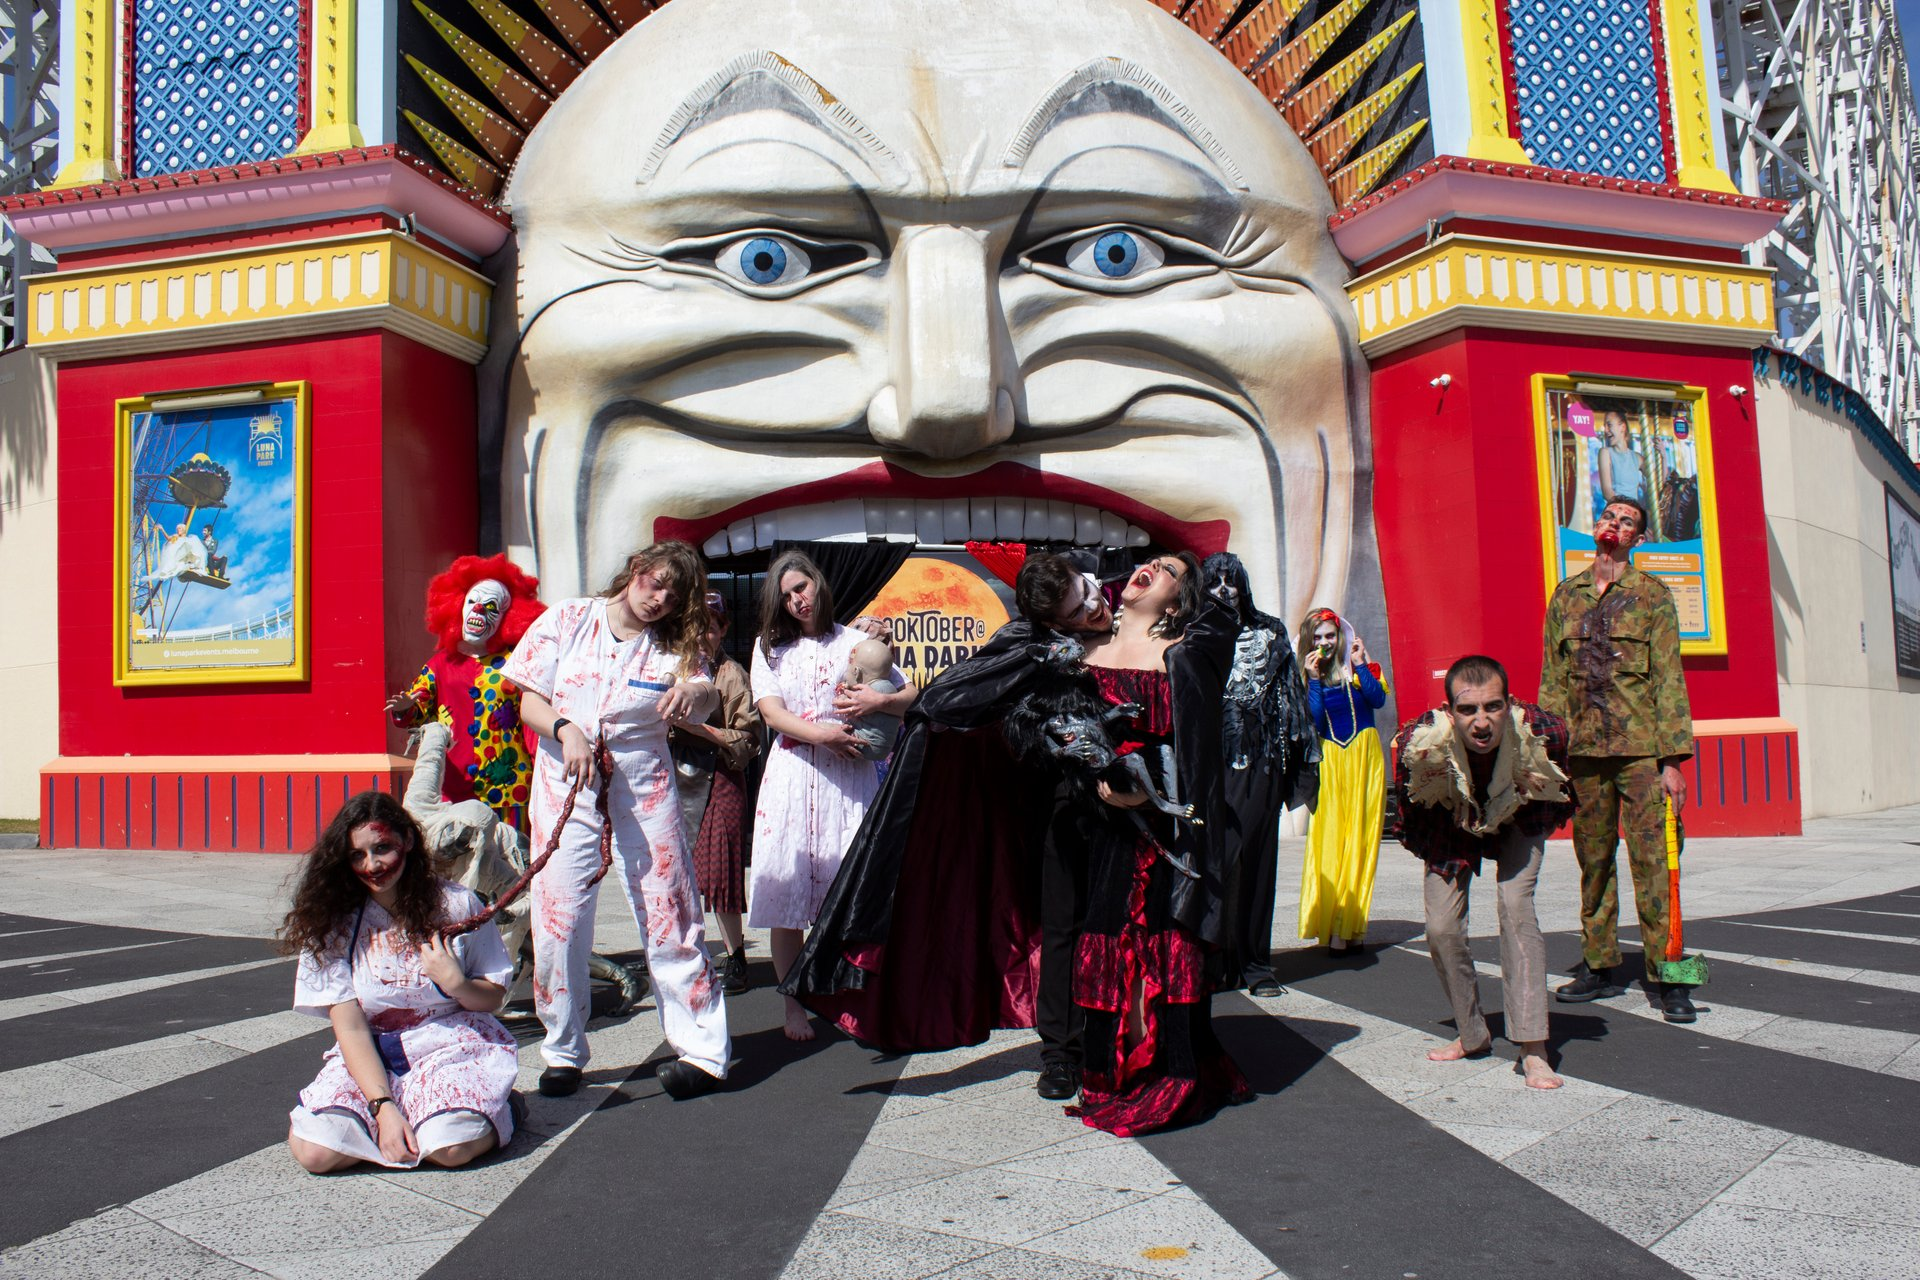 Spooktober, Halloween Festival Melbourne 2020